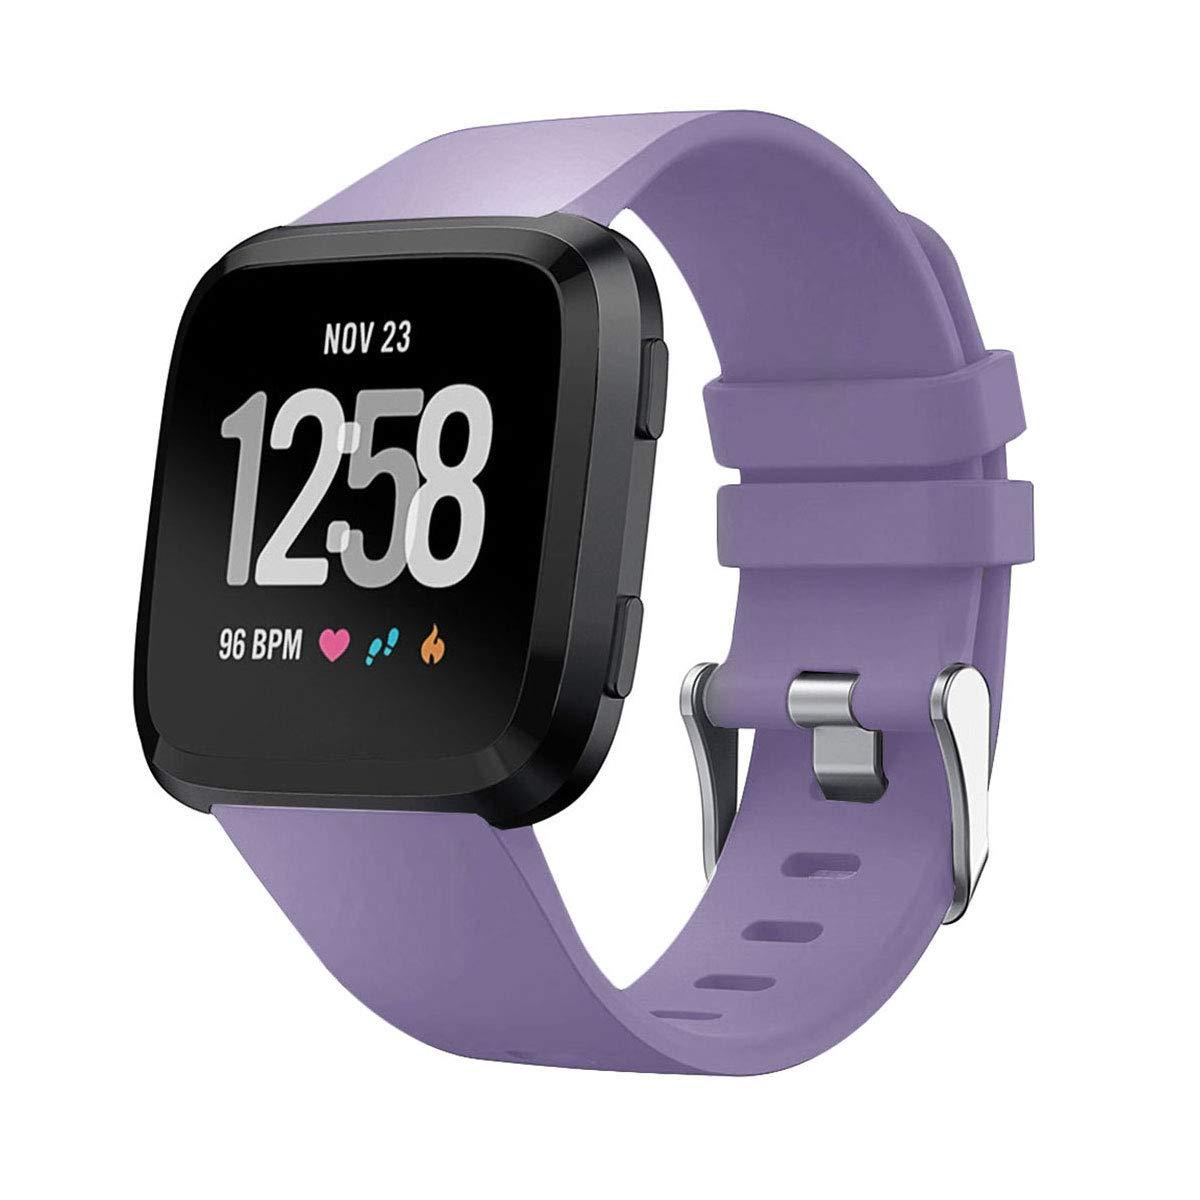 JOMOQ for Fitbit Versaバンド、最新調節可能なスポーツストラップ交換バンドfor Fitbit Versa Smartwatch Fitness Wristbands B07BS665T4 ライトパープル Small